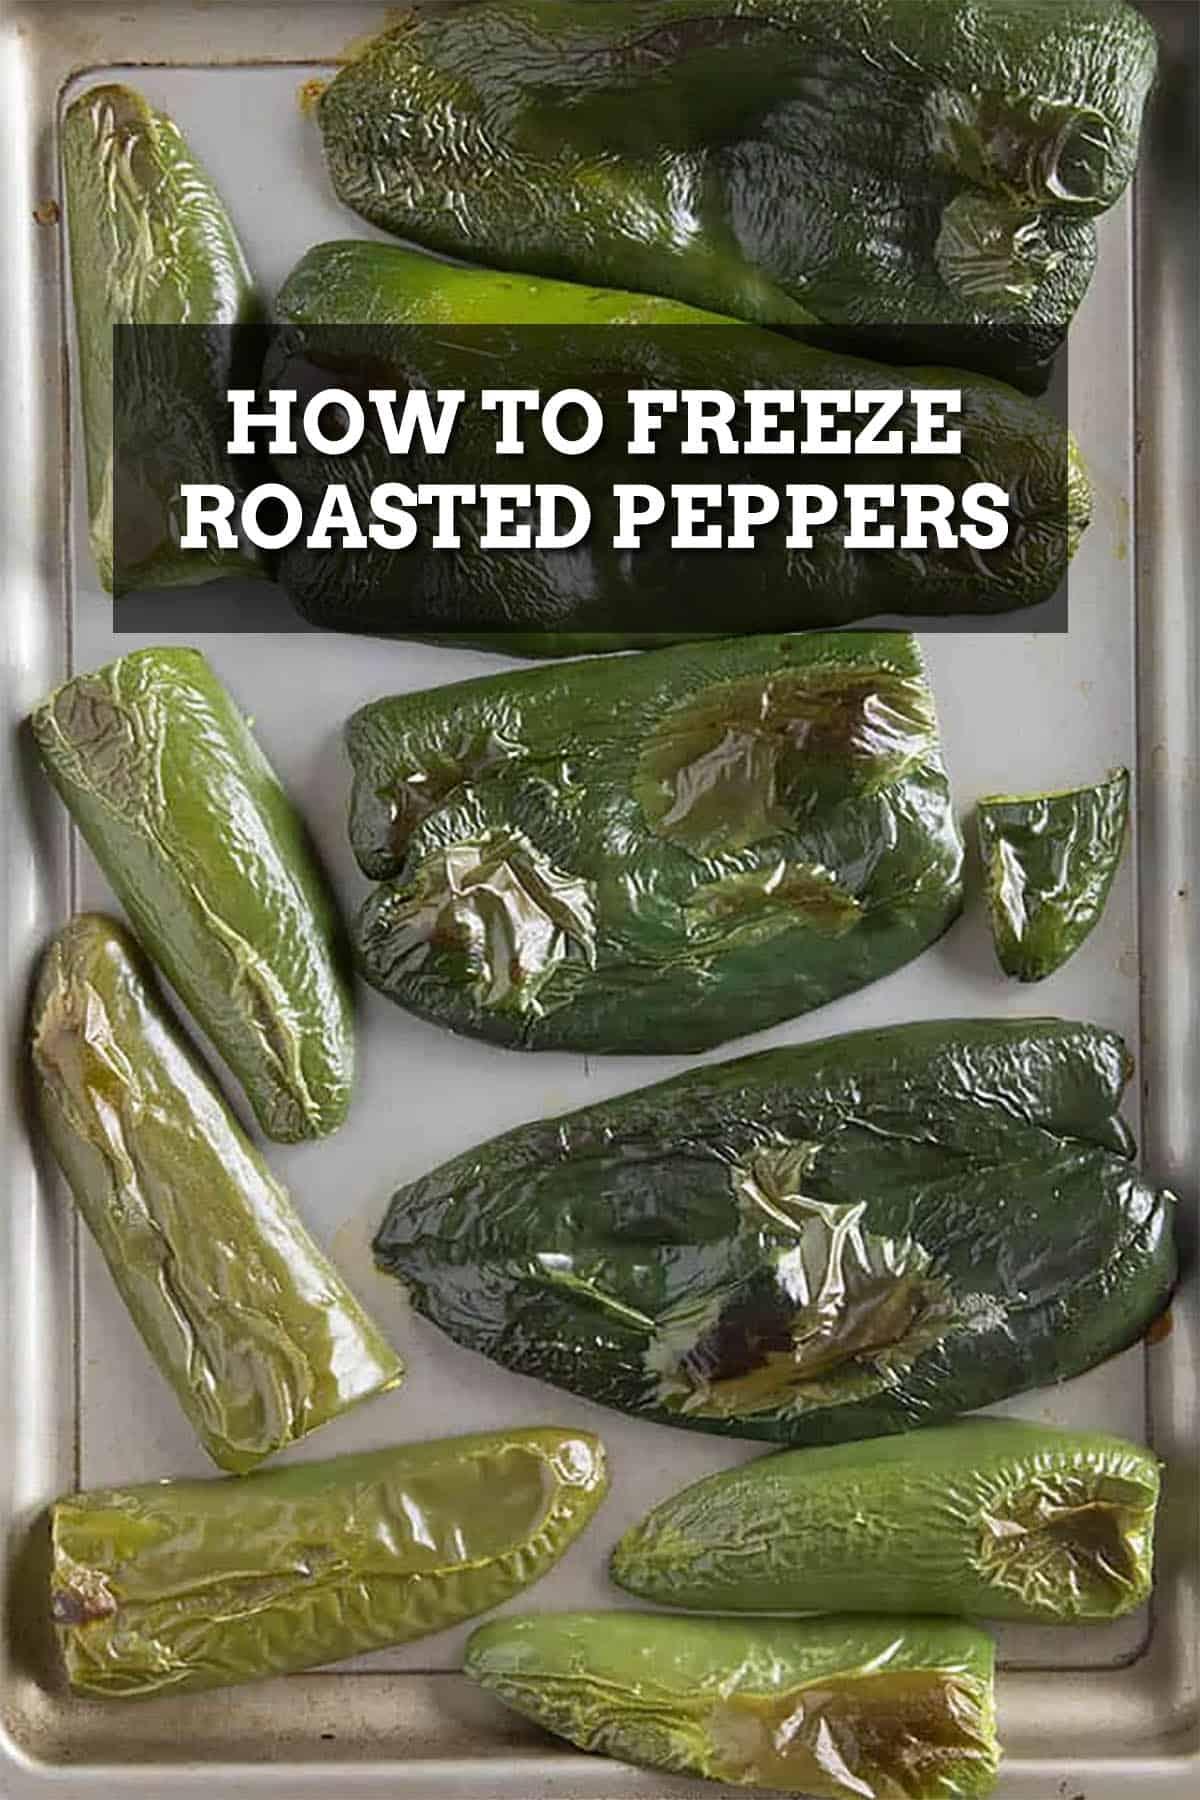 Freezing Roasted Chili Peppers